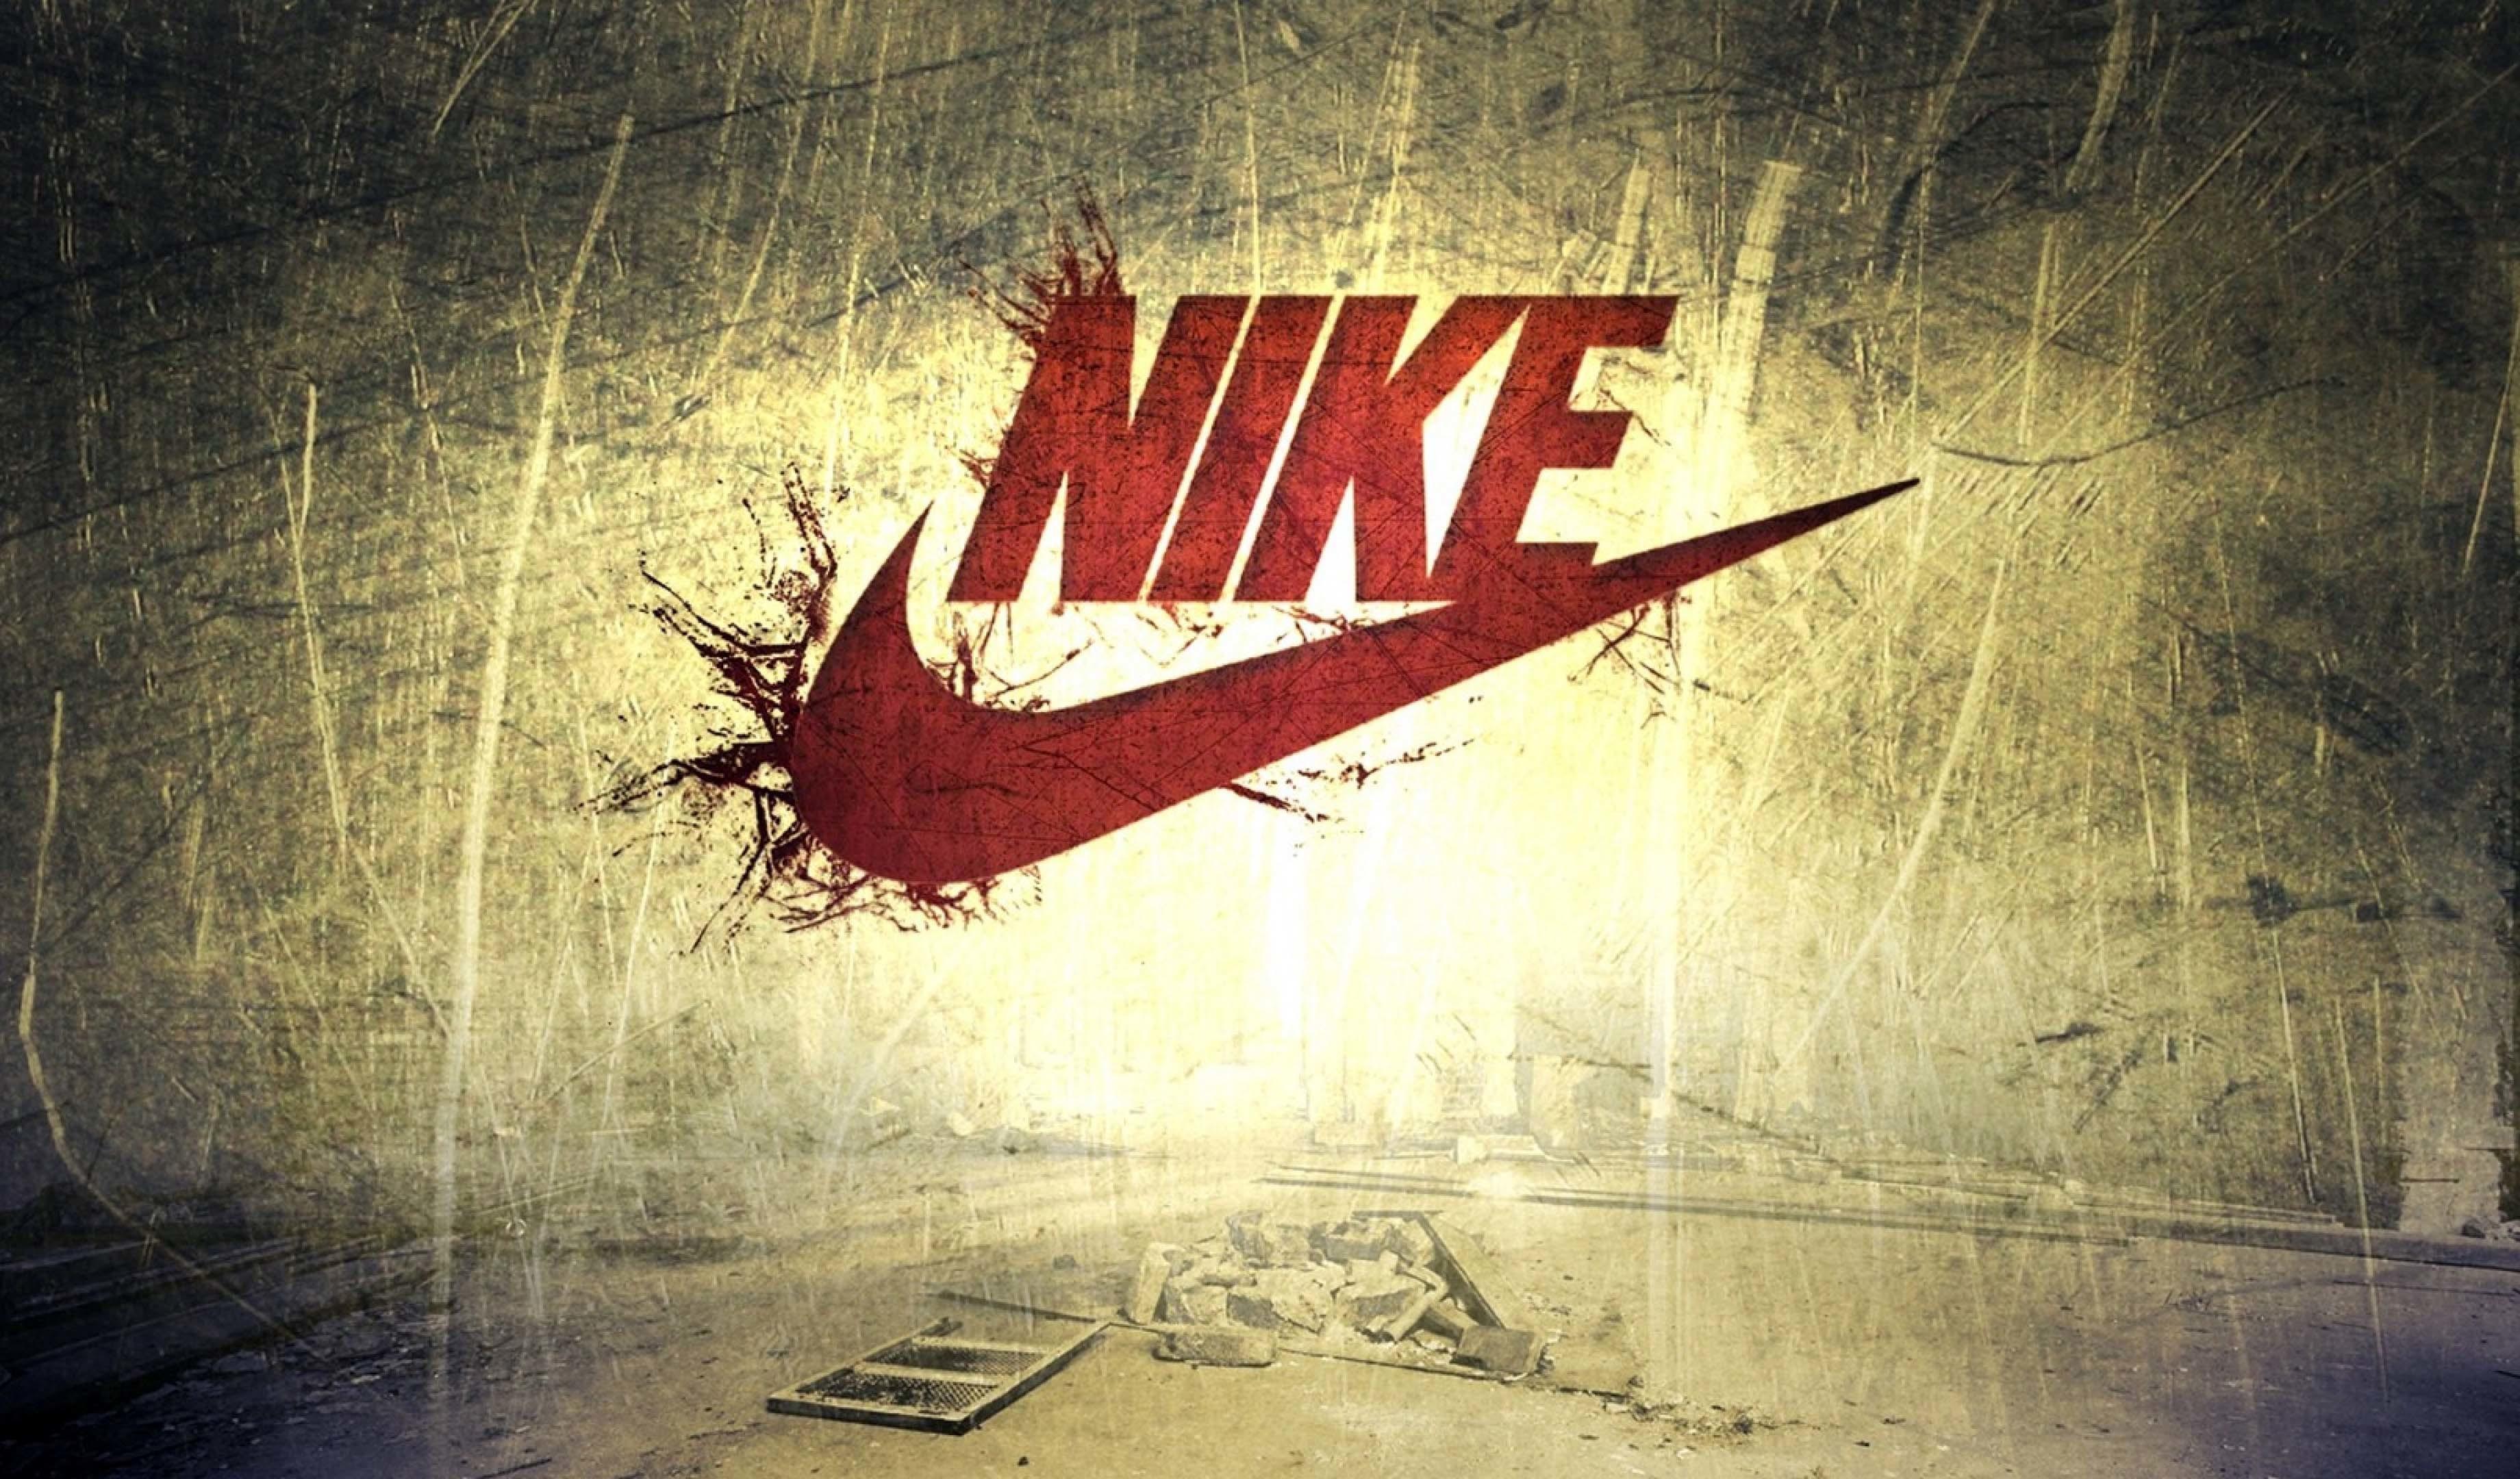 Adidas Logo 3d Wallpapers Hd Nike Logo Wallpaper Hd 2017 183 ①